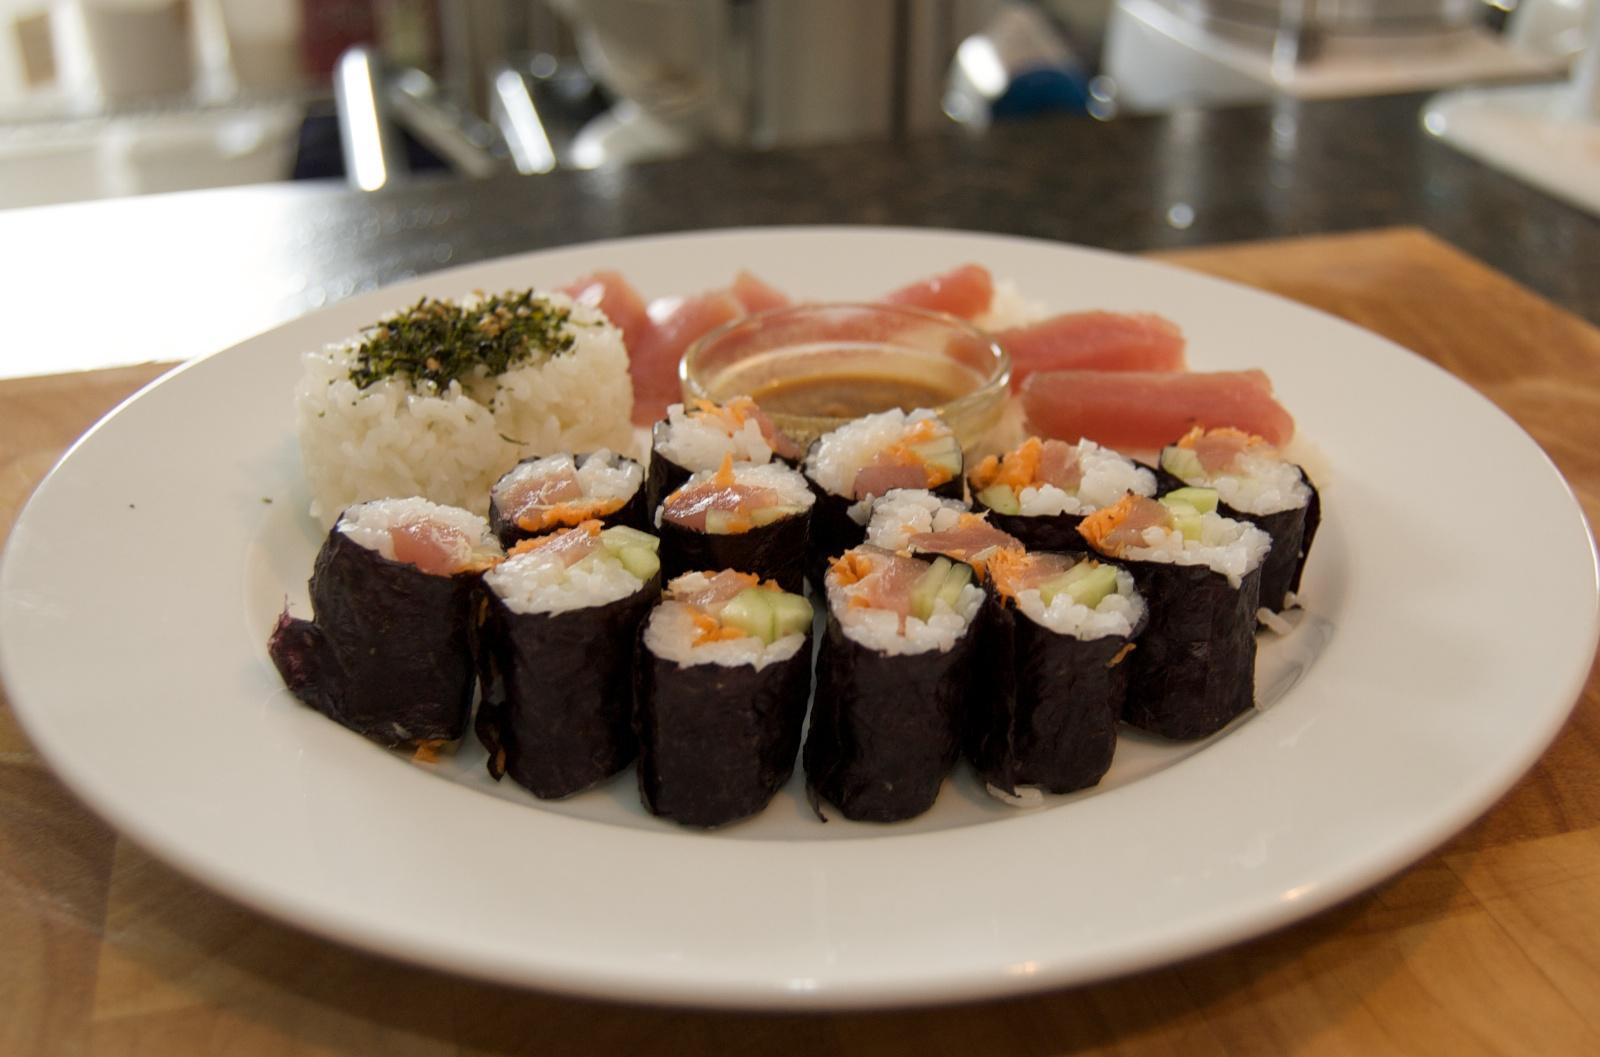 http://blog.rickk.com/food/2010/07/17/sushi1.jpg